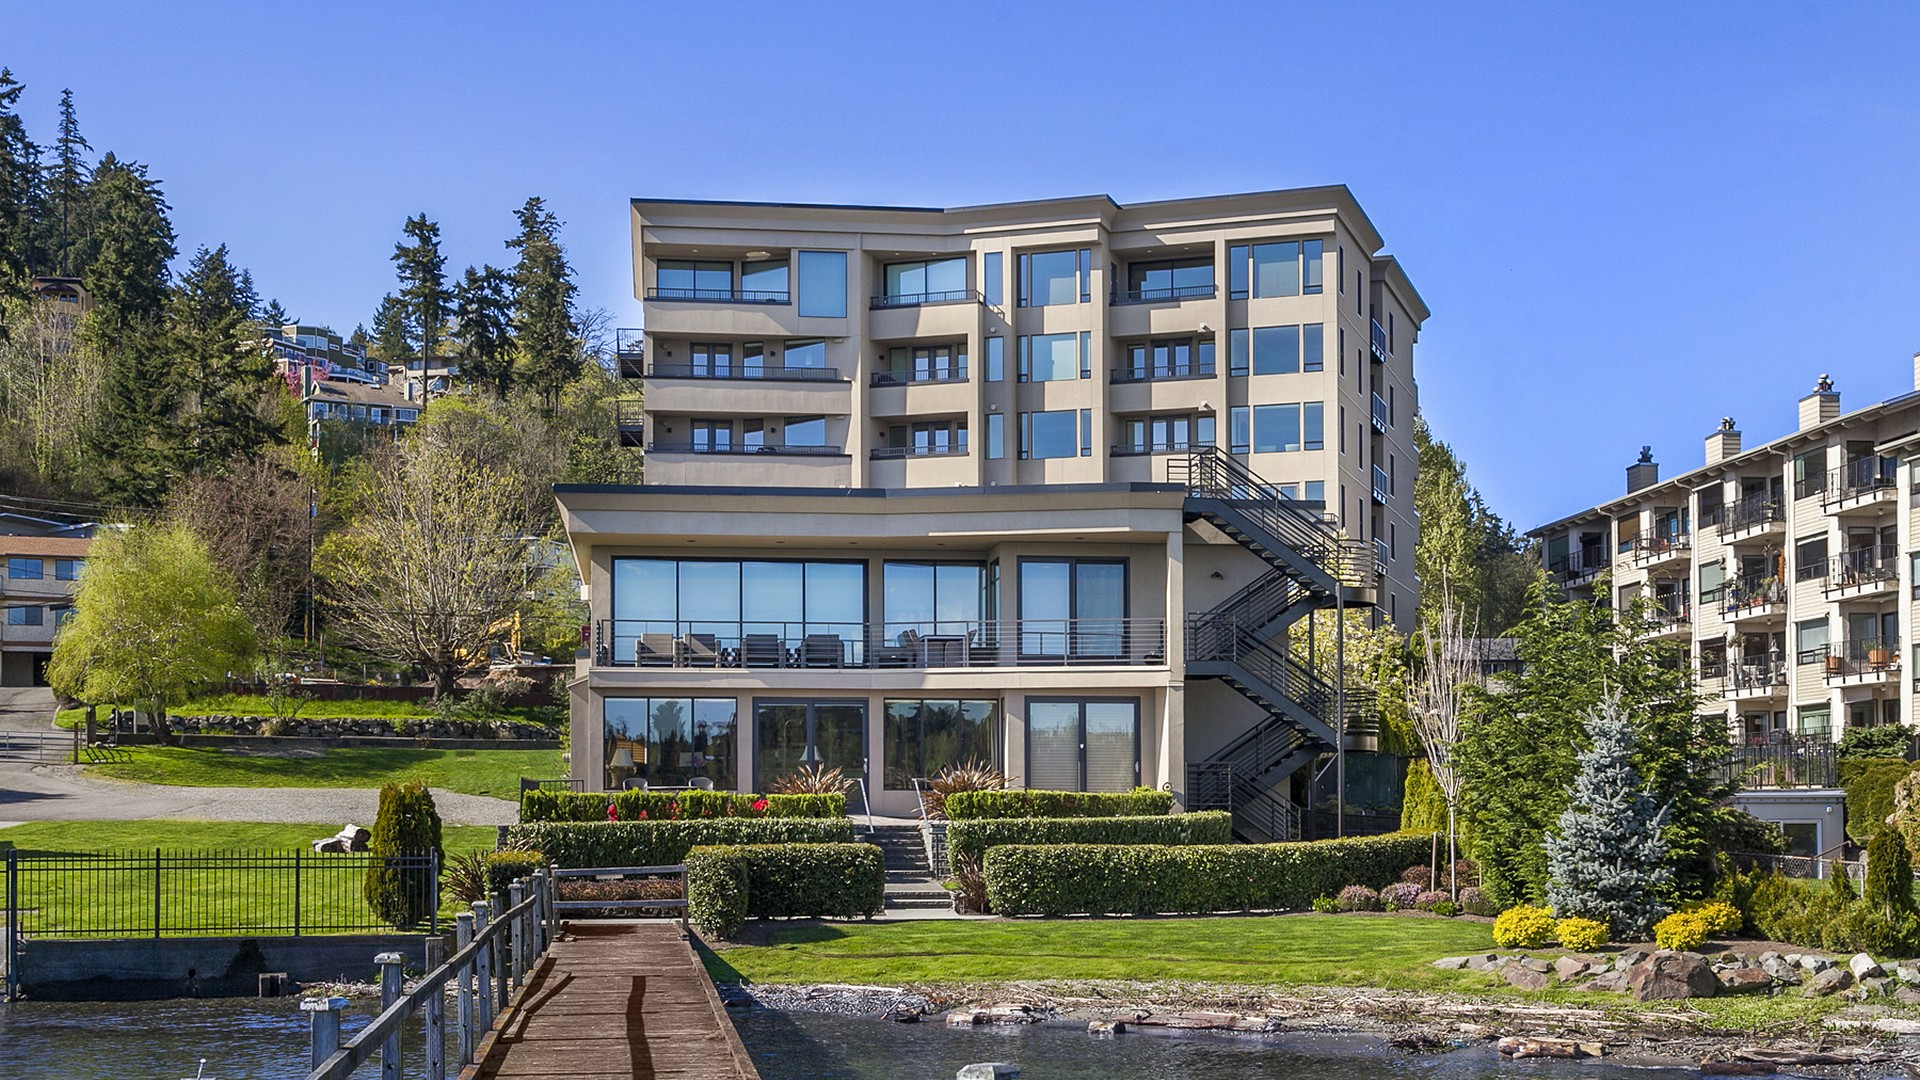 Condominium for Sale at Juanita Condo 9123 NE Juanita Dr #306 Kirkland, Washington 98034 United States